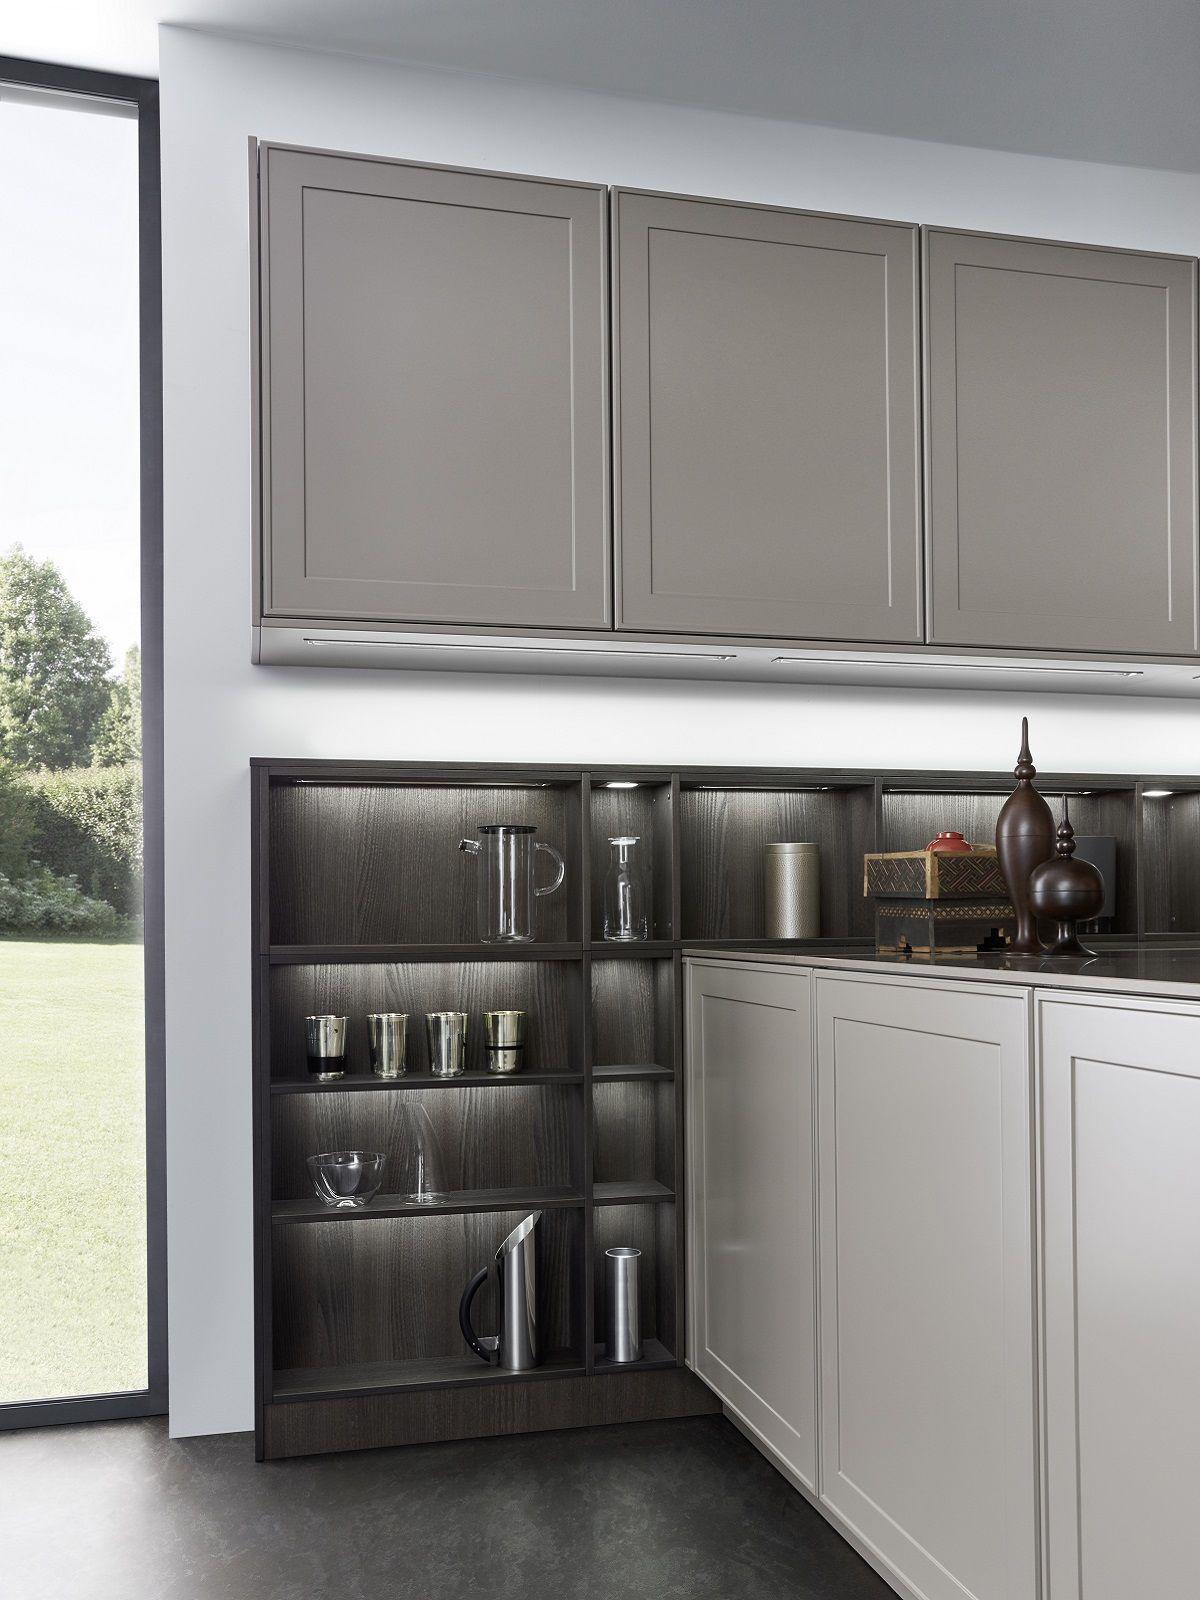 pin by caal chest apply on verve fs modern classic kitchen kitchen design kitchen interior on kitchen interior classic id=90373